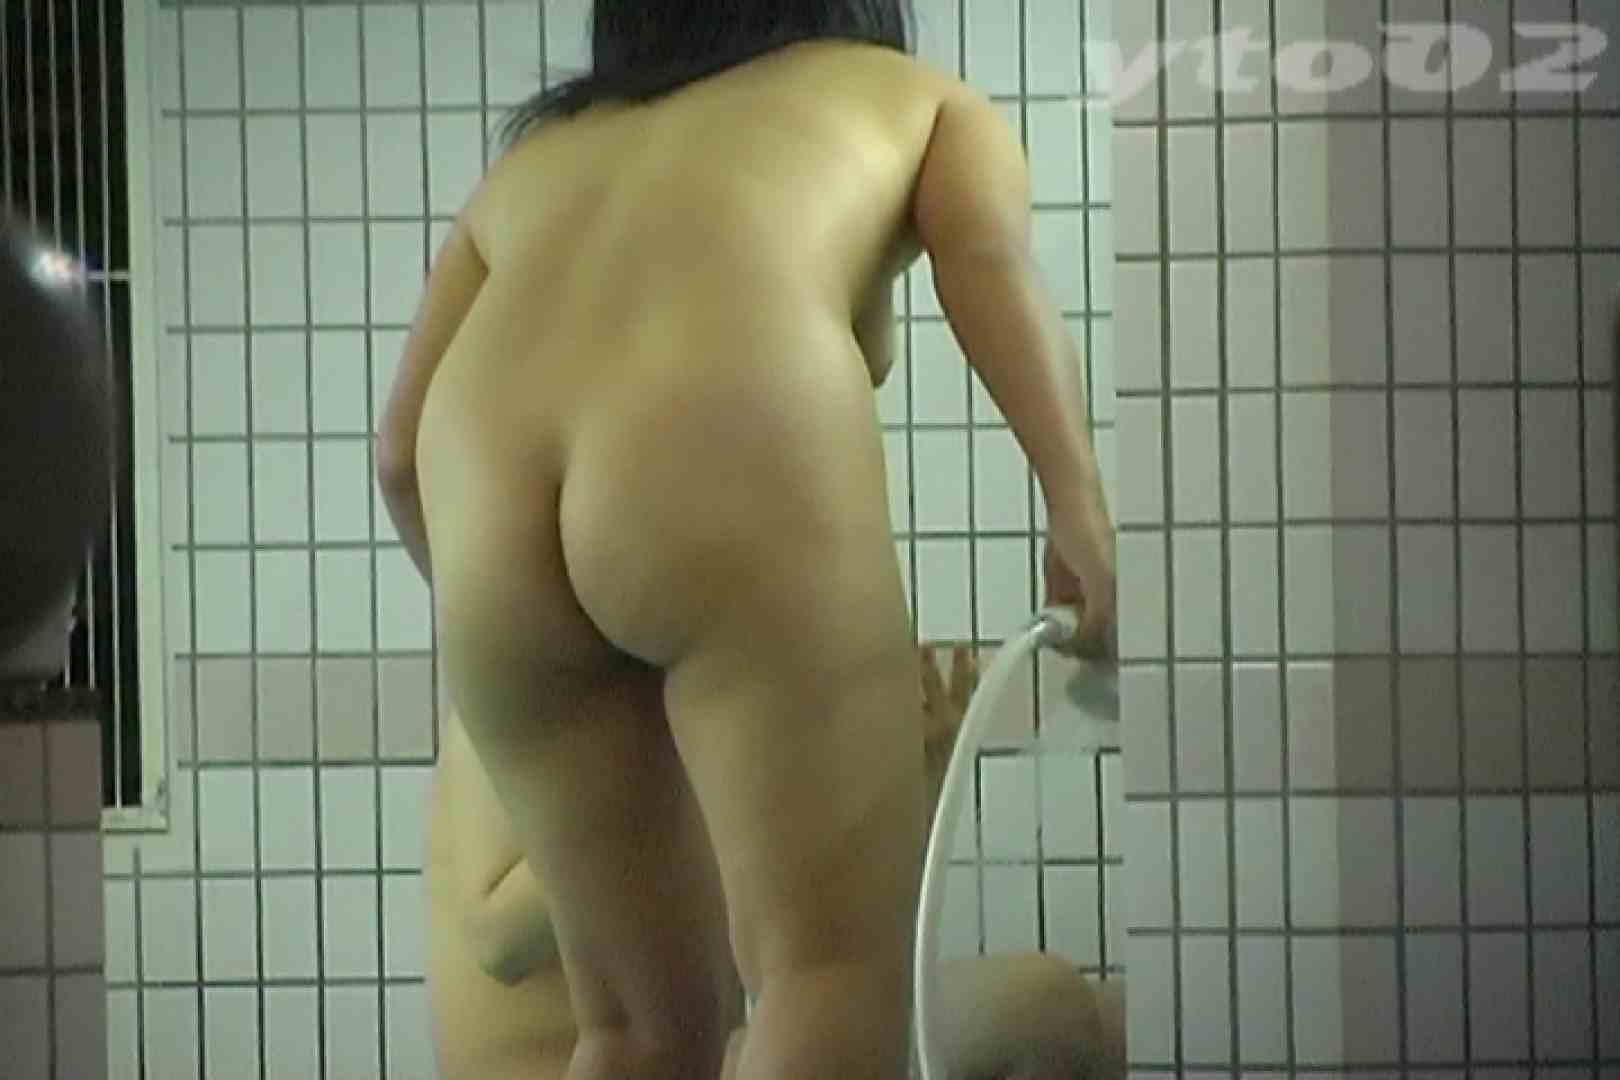 【期間限定配信】合宿ホテル女風呂盗撮 Vol.15 露天丸見え | 女湯  106画像 73